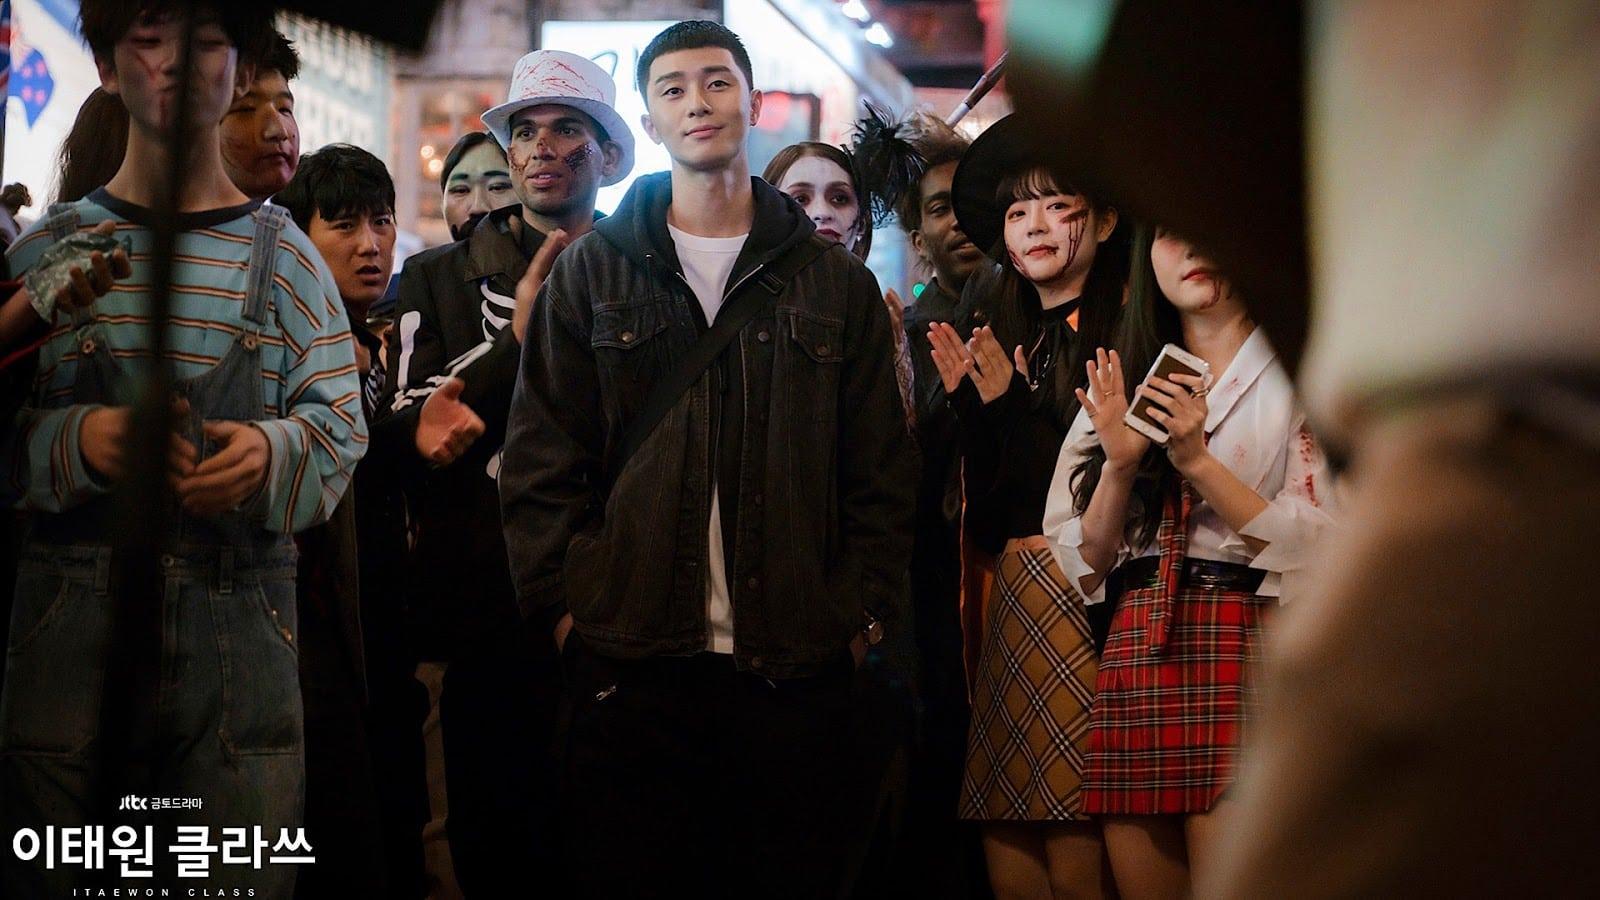 Korean drama K-drama Itaewon Class Park Sae-ro-yi and Chairman Jang Dae-hee gives hopeful message against COVID-19 coronavirus